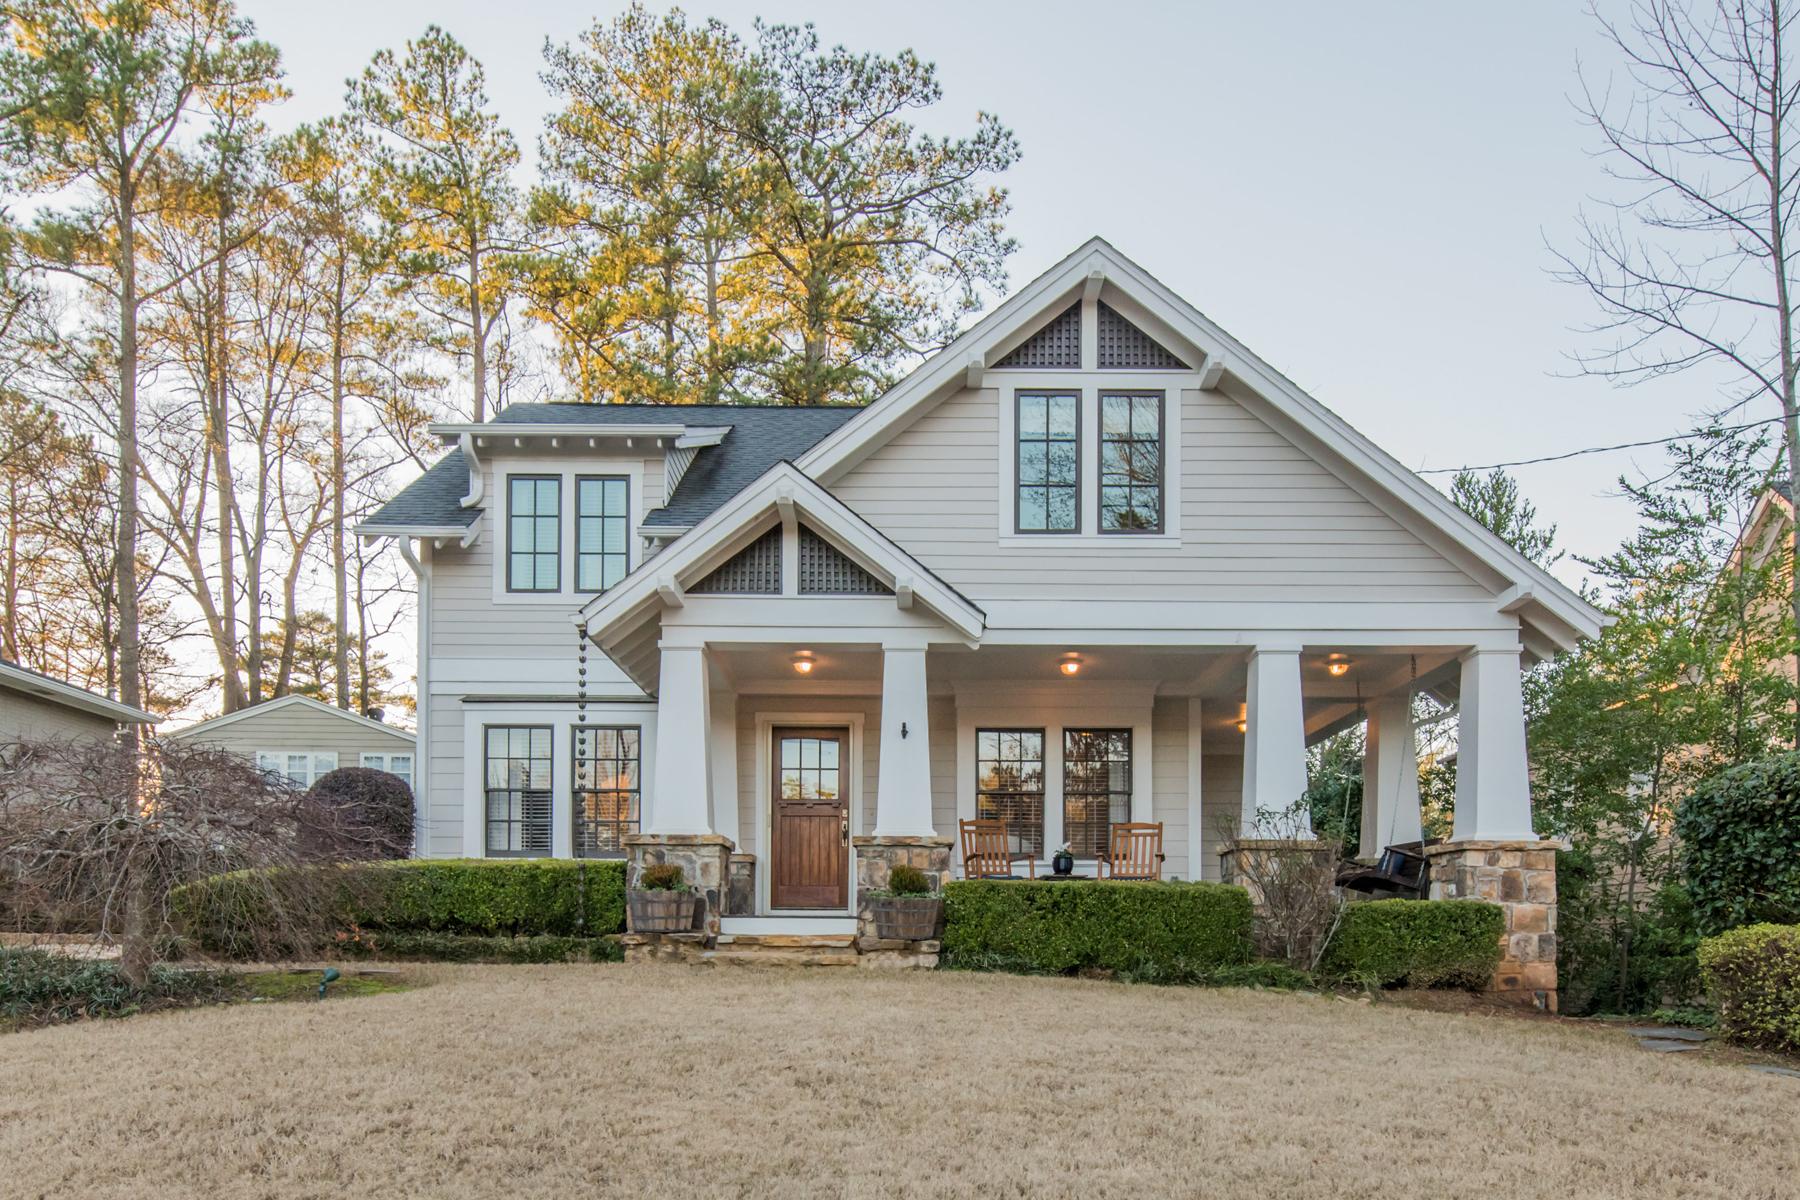 Single Family Home for Sale at Charming North Buckhead Craftsman 4002 North Ivy Rd Atlanta, Georgia 30342 United States